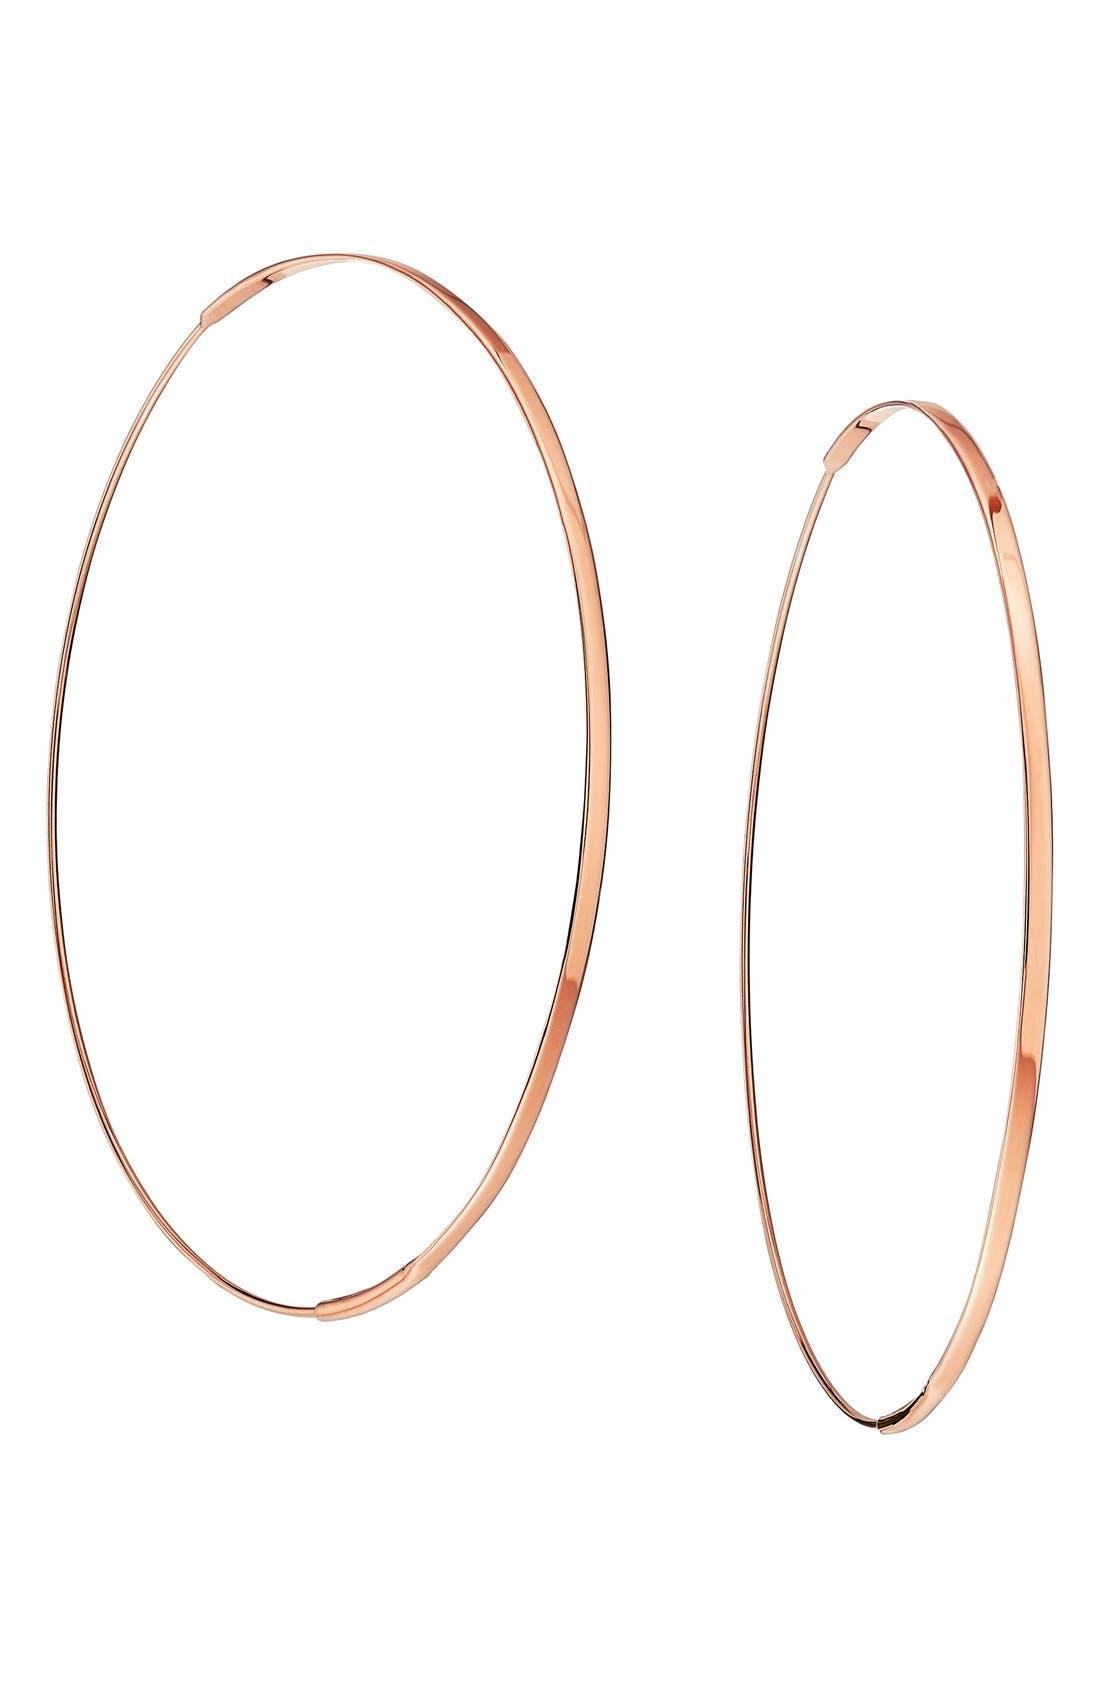 Alternate Image 1 Selected - Lana Jewelry 'Large Flat Magic' Hoop Earrings